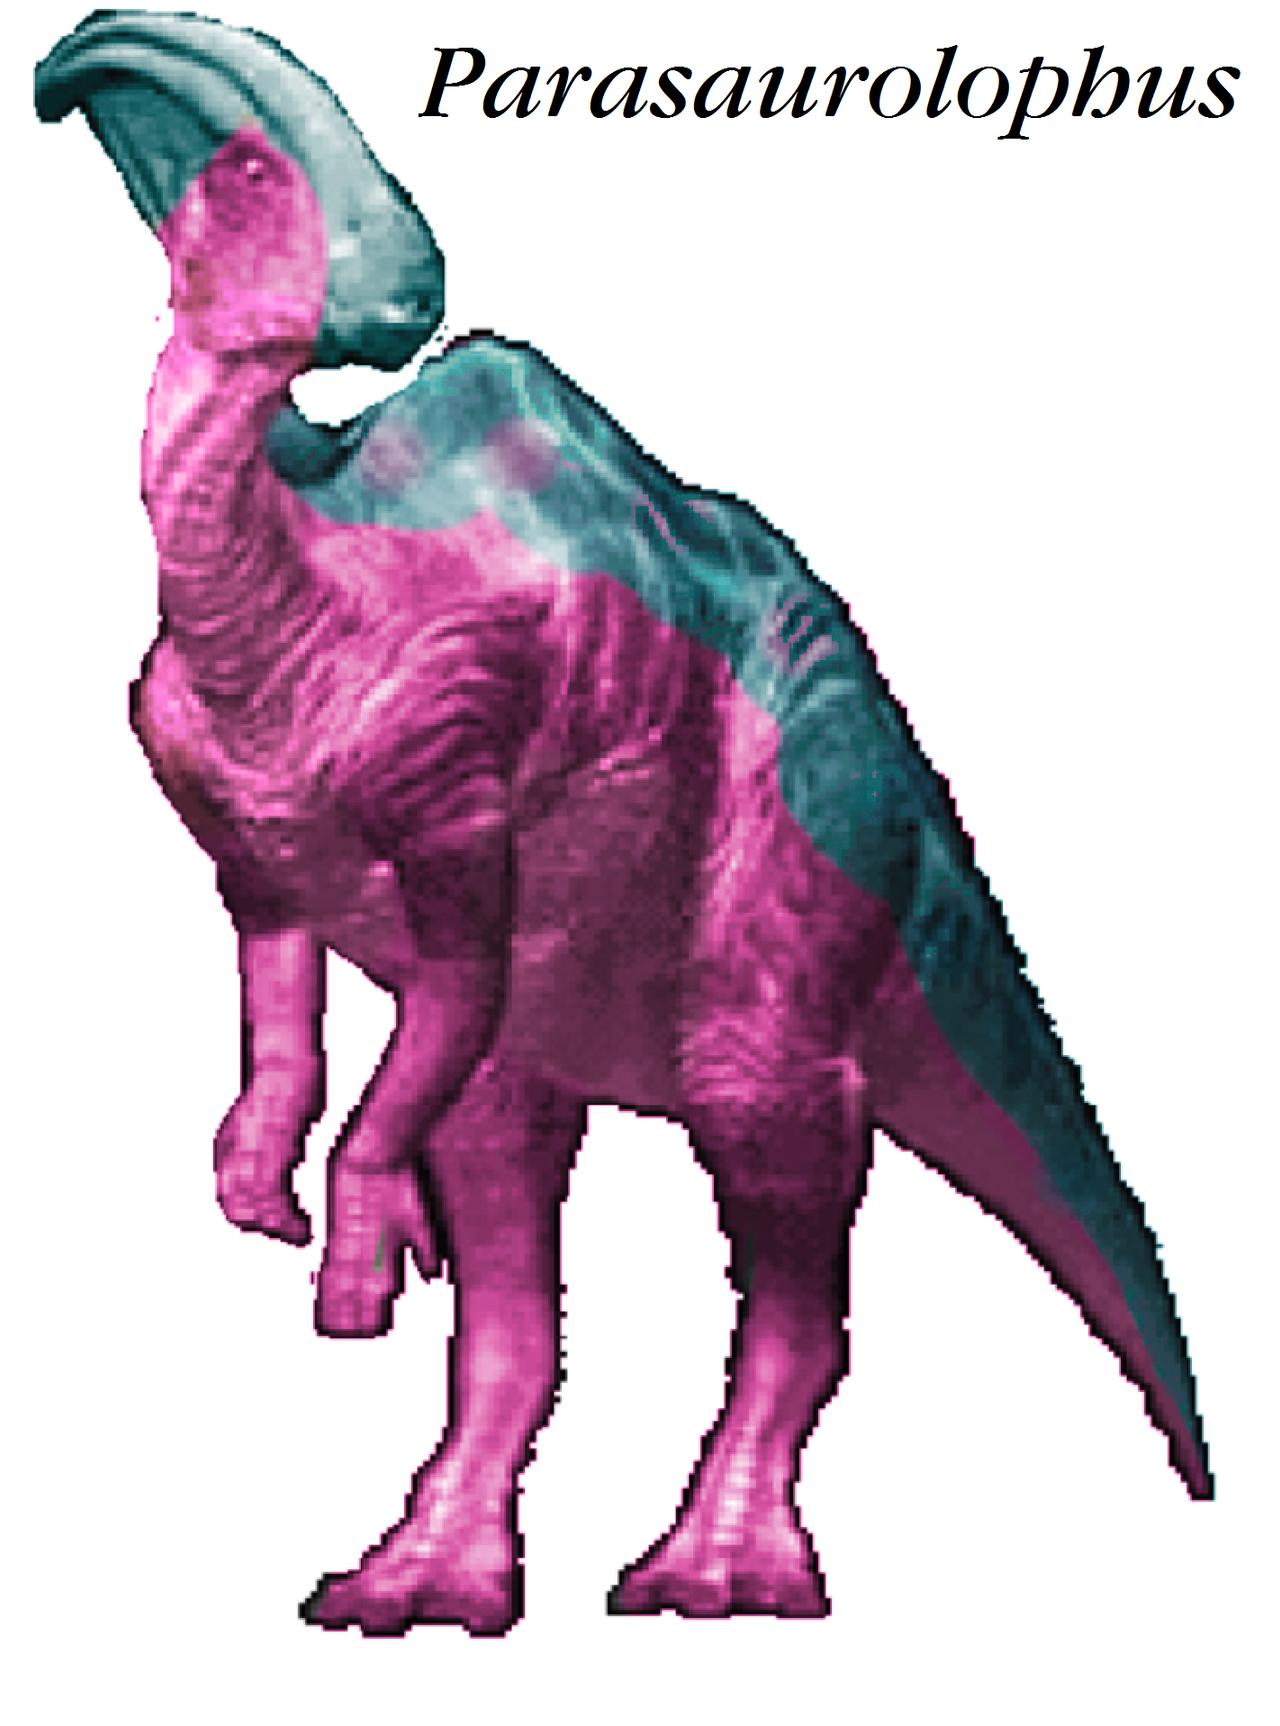 Dinosaur Train Parasaurolophus In Real Form By Vespisaurus On ...